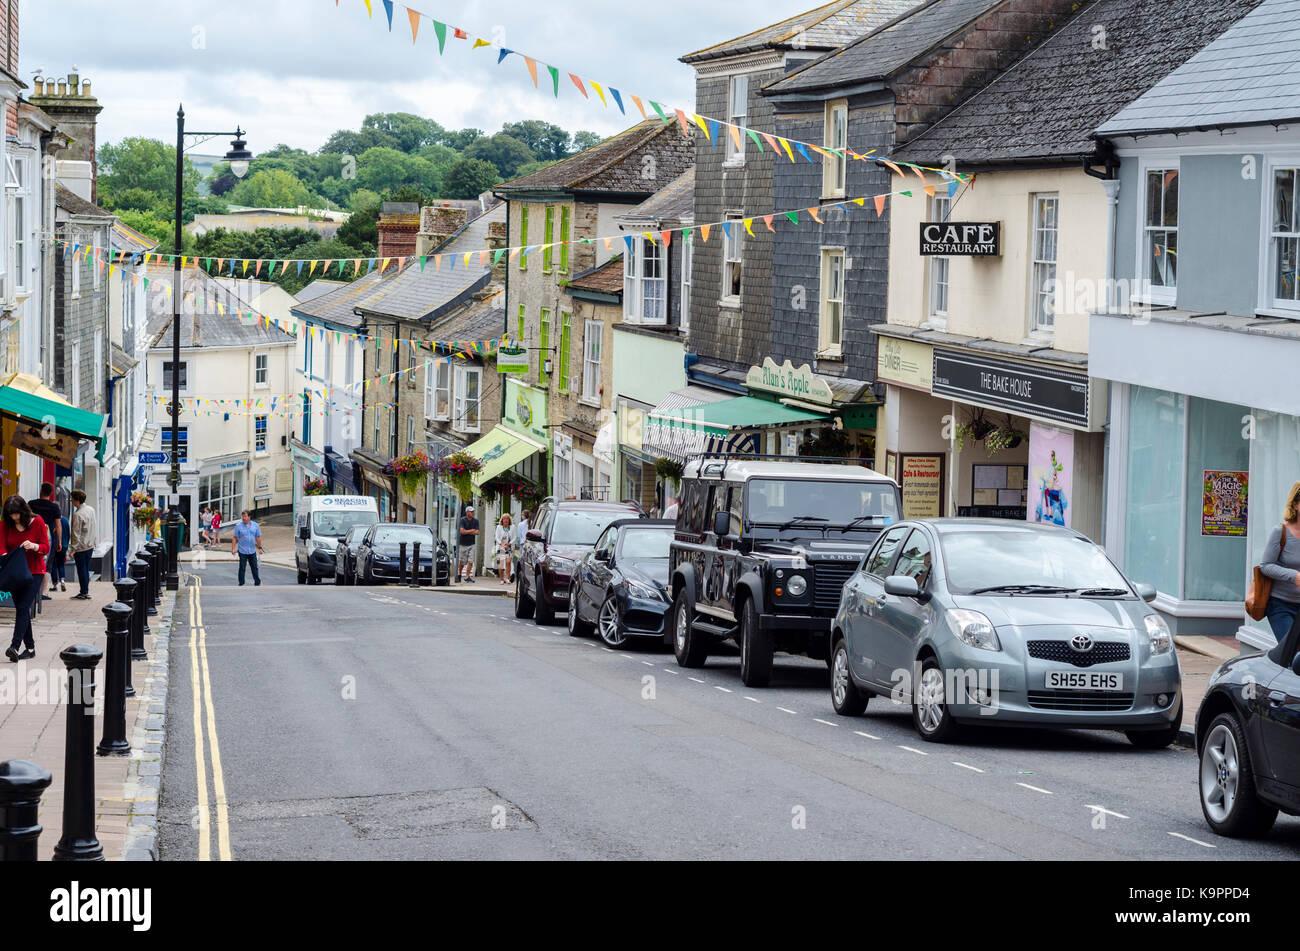 Fore Street, Kingsbridge market town in South Hams, Devon, England, UK - Stock Image